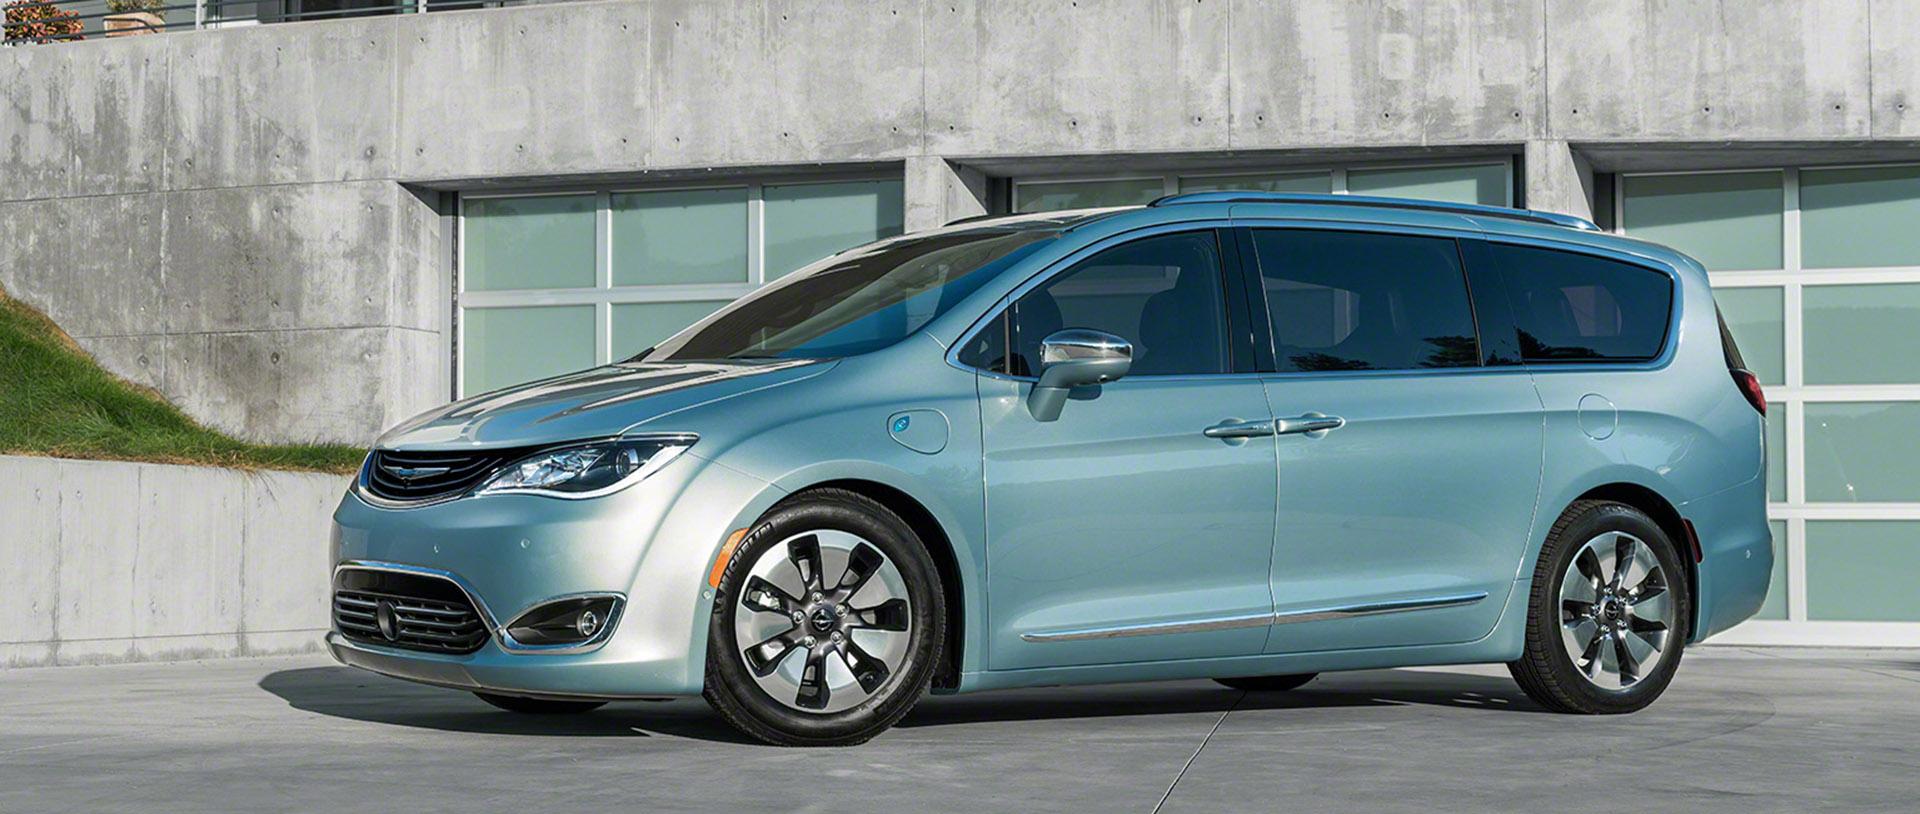 2017 Chrysler Pacifica Minivan Consumer Reports